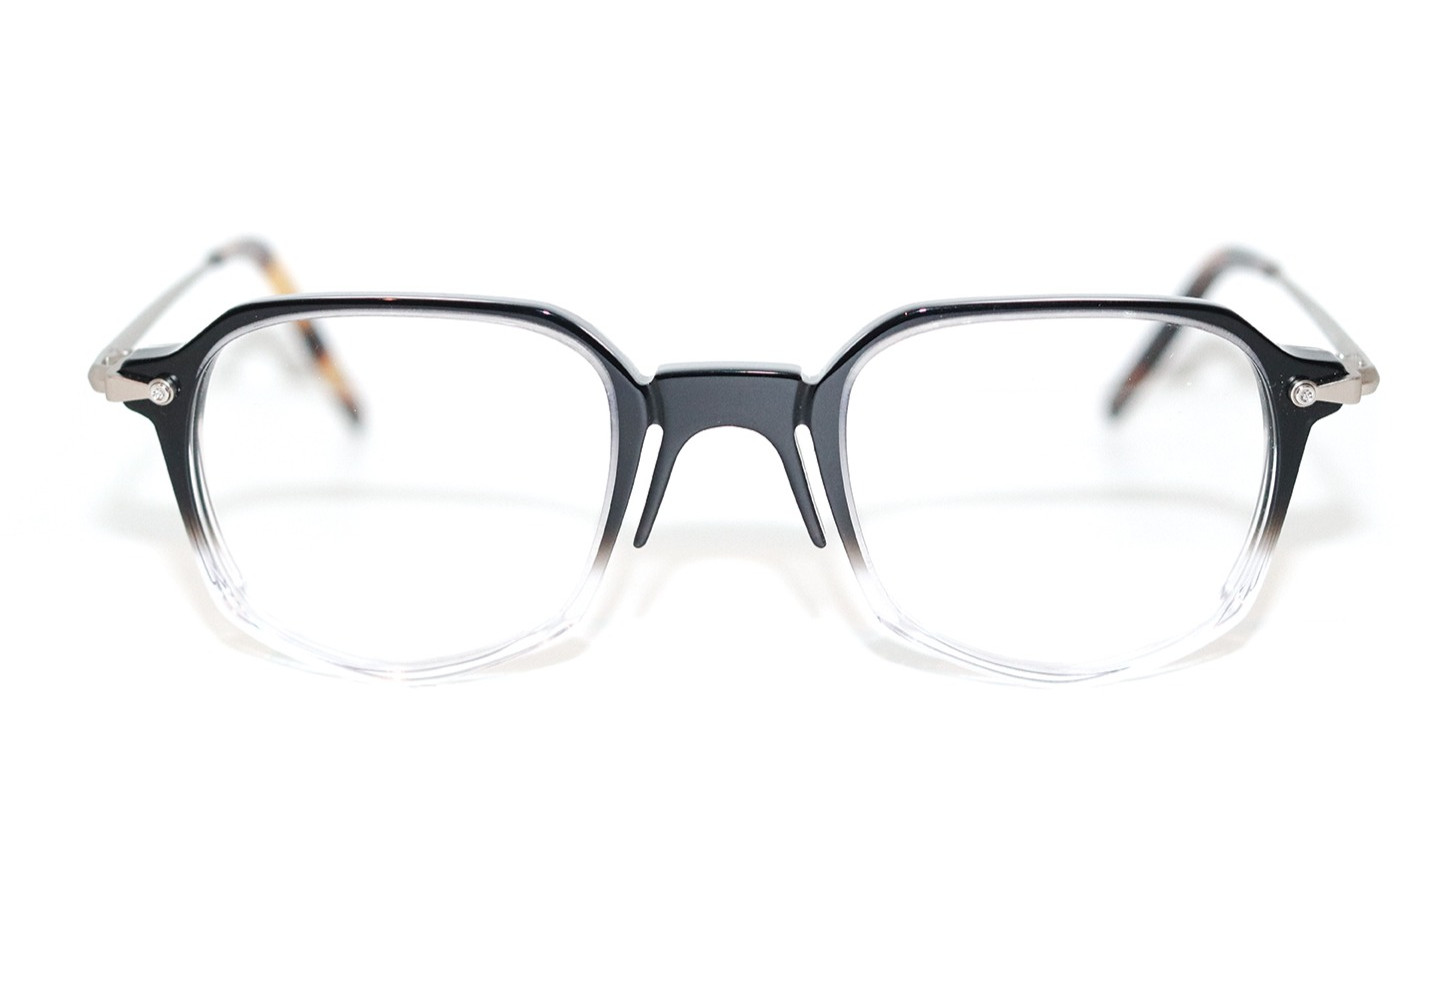 kleys-lunettes-francaises-MAURICE-black-